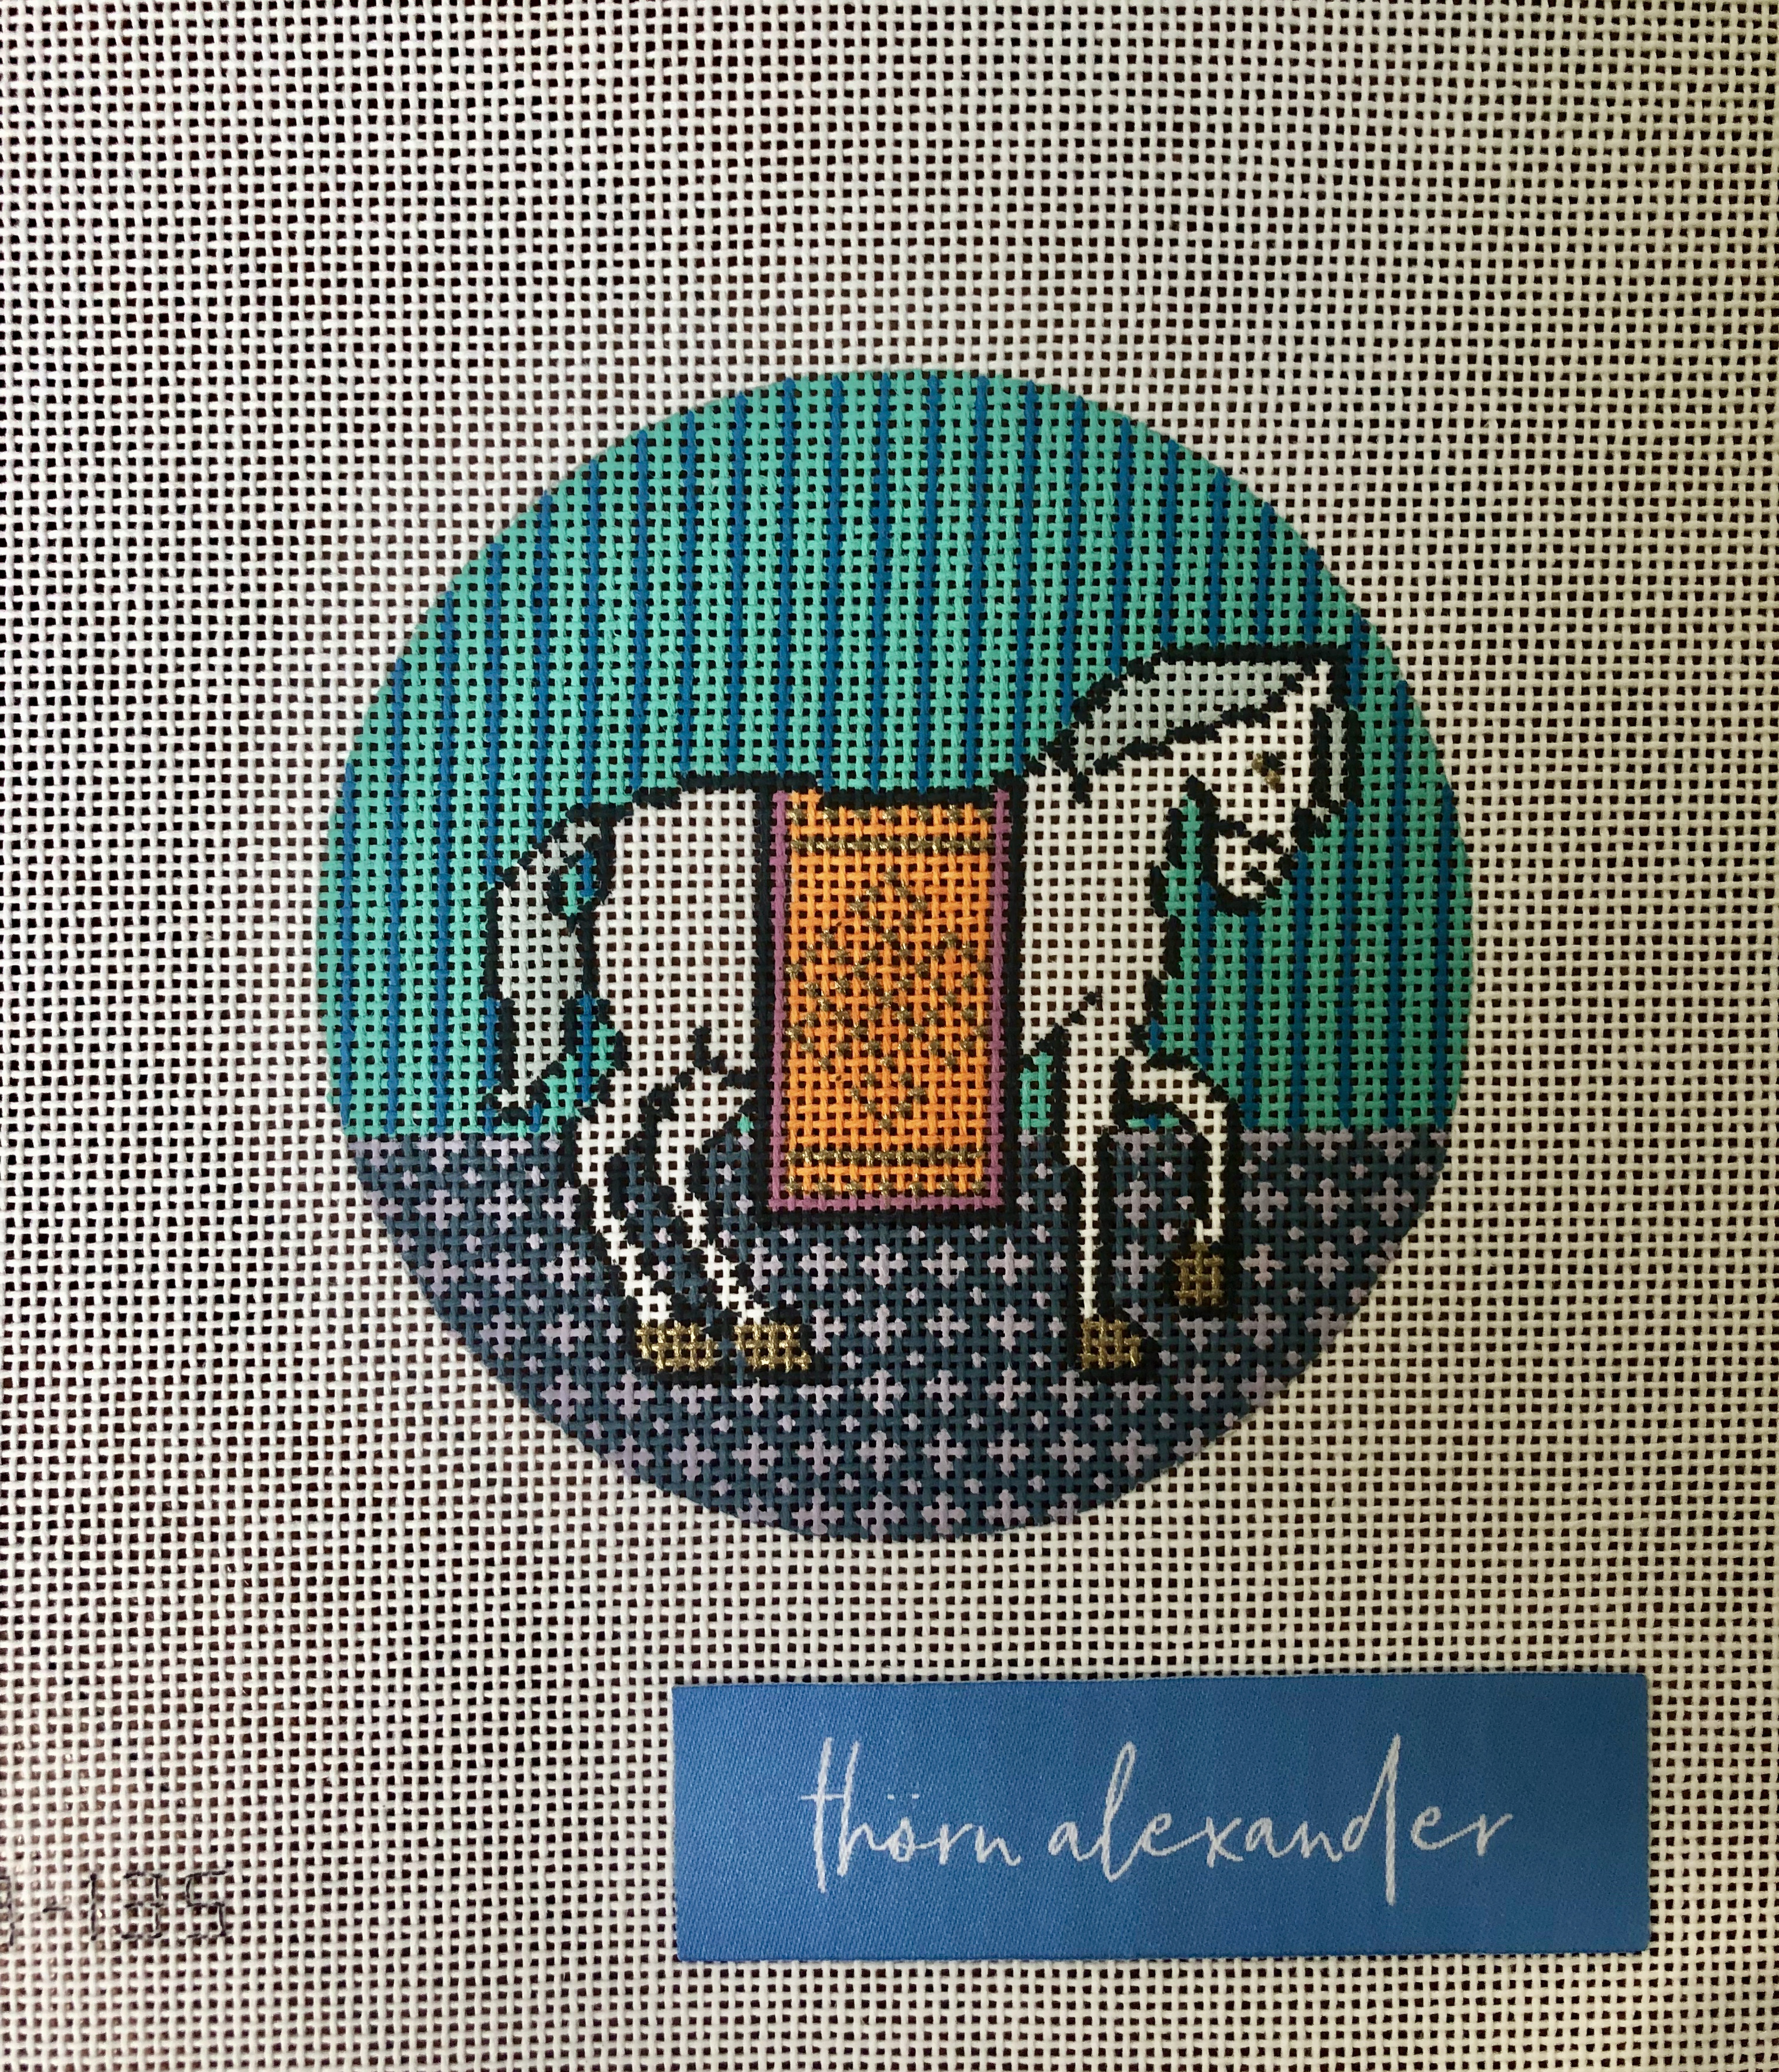 Thorn Alexander Hanne The Horse